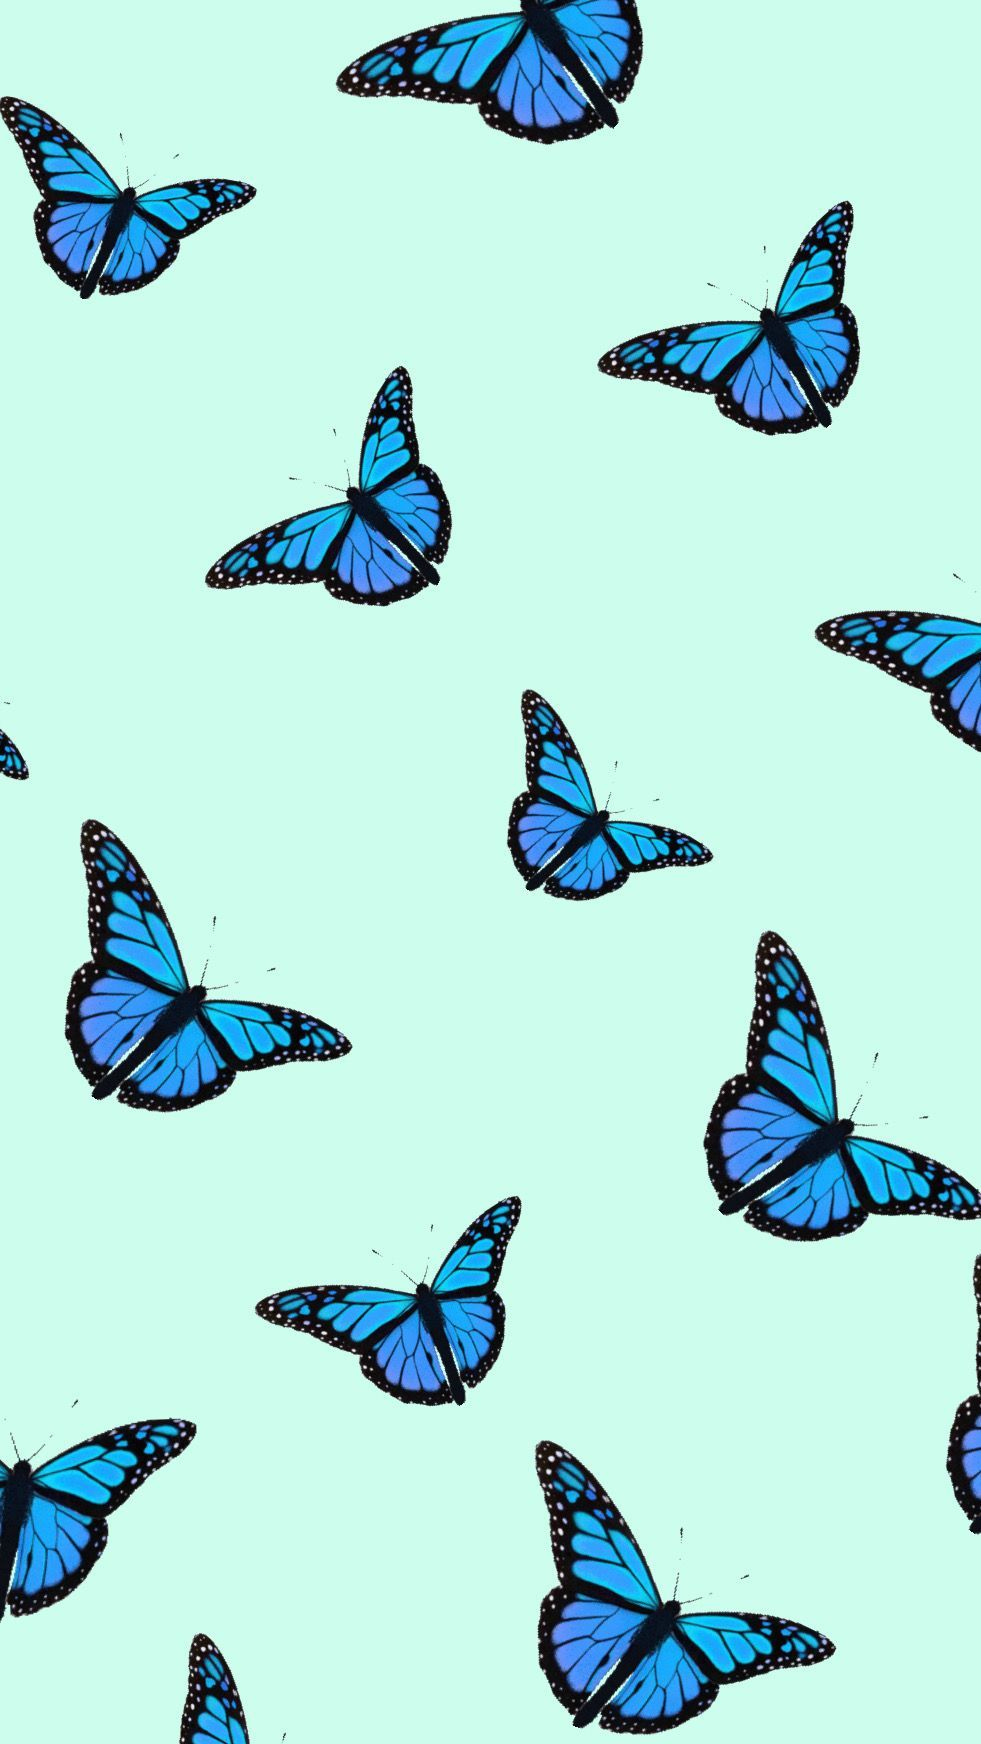 Aesthetic Butterflies Wallpapers - Wallpaper Cave